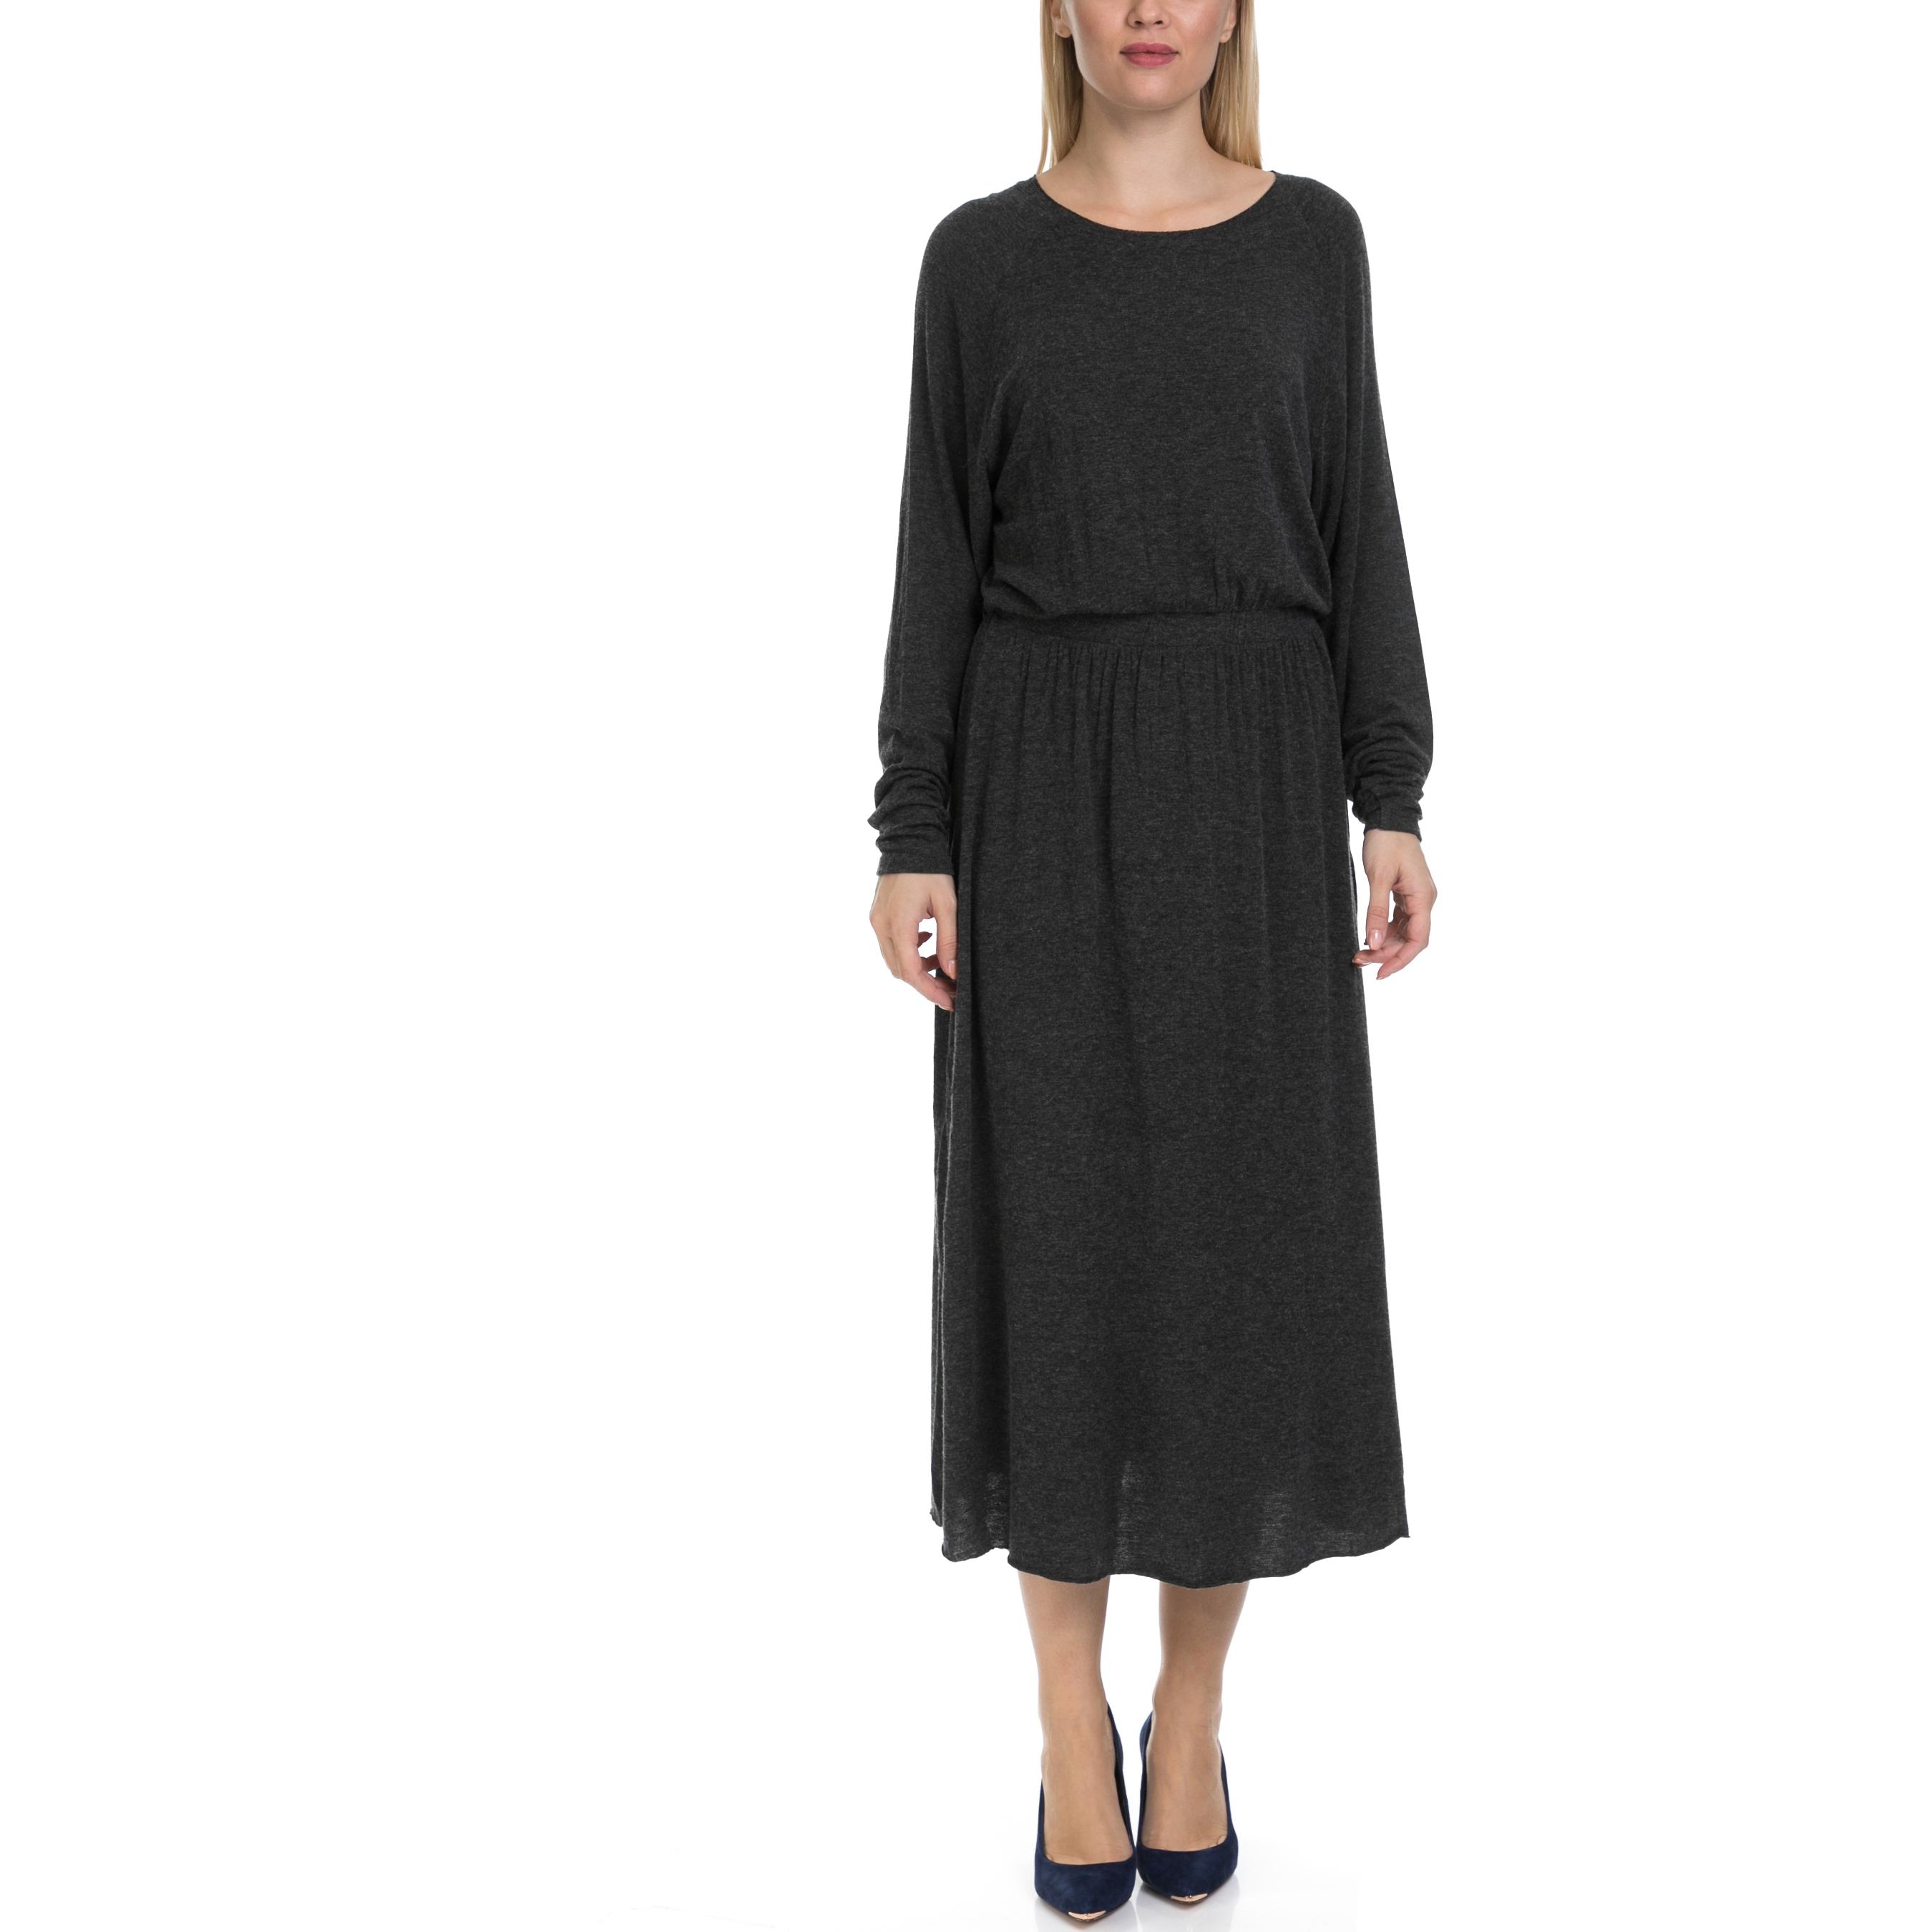 AMERICAN VINTAGE - Γυναικείο μάξι φόρεμα American Vintage ανθρακί γυναικεία ρούχα φορέματα μάξι